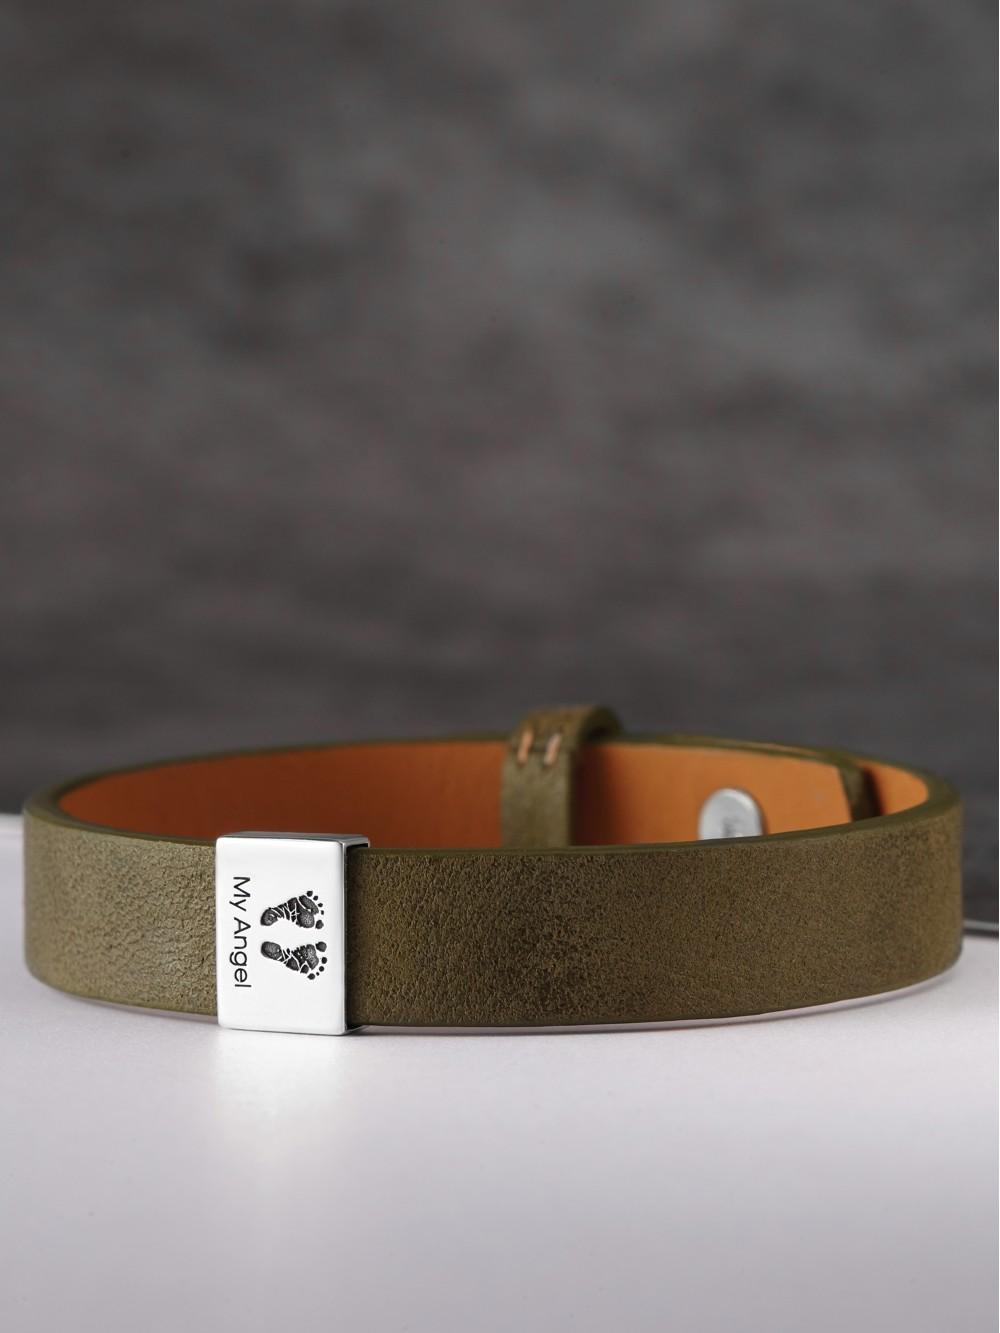 Baby Footprint Band Bracelet